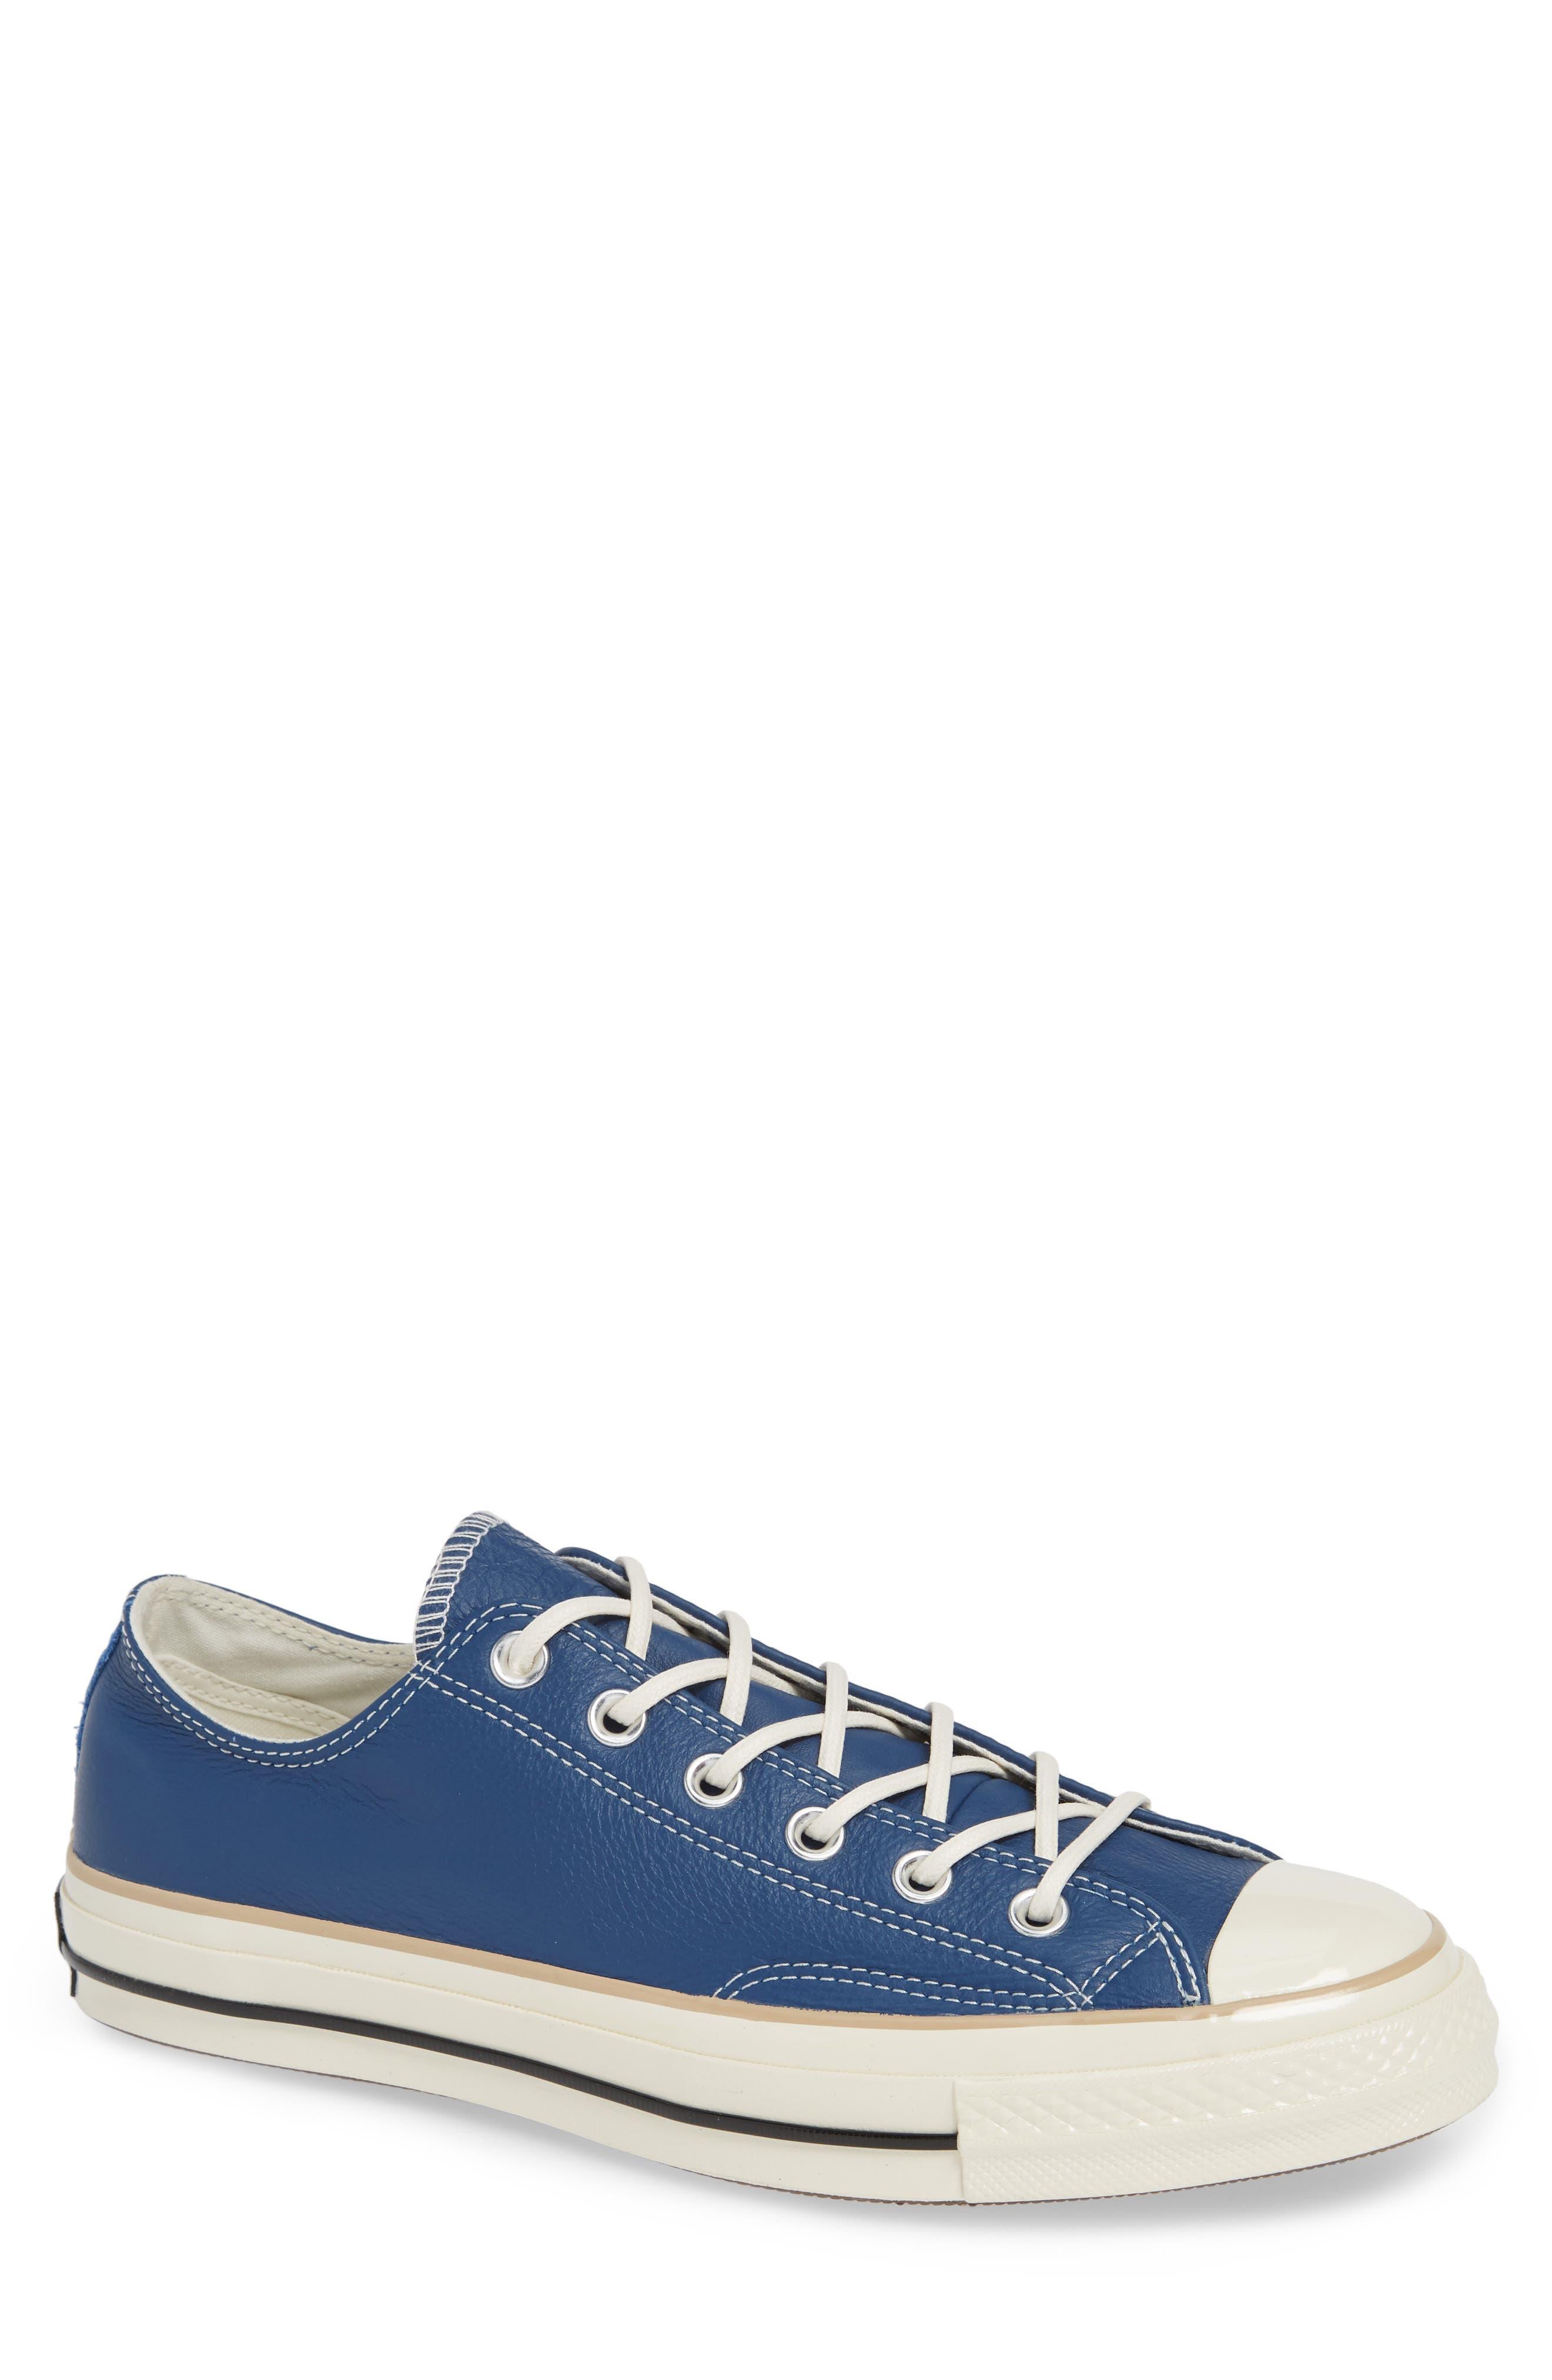 Chuck 70 Boot Leather Low Top Sneaker,                         Main,                         color, DARK BURGUNDY/ CYAN/ EGRET